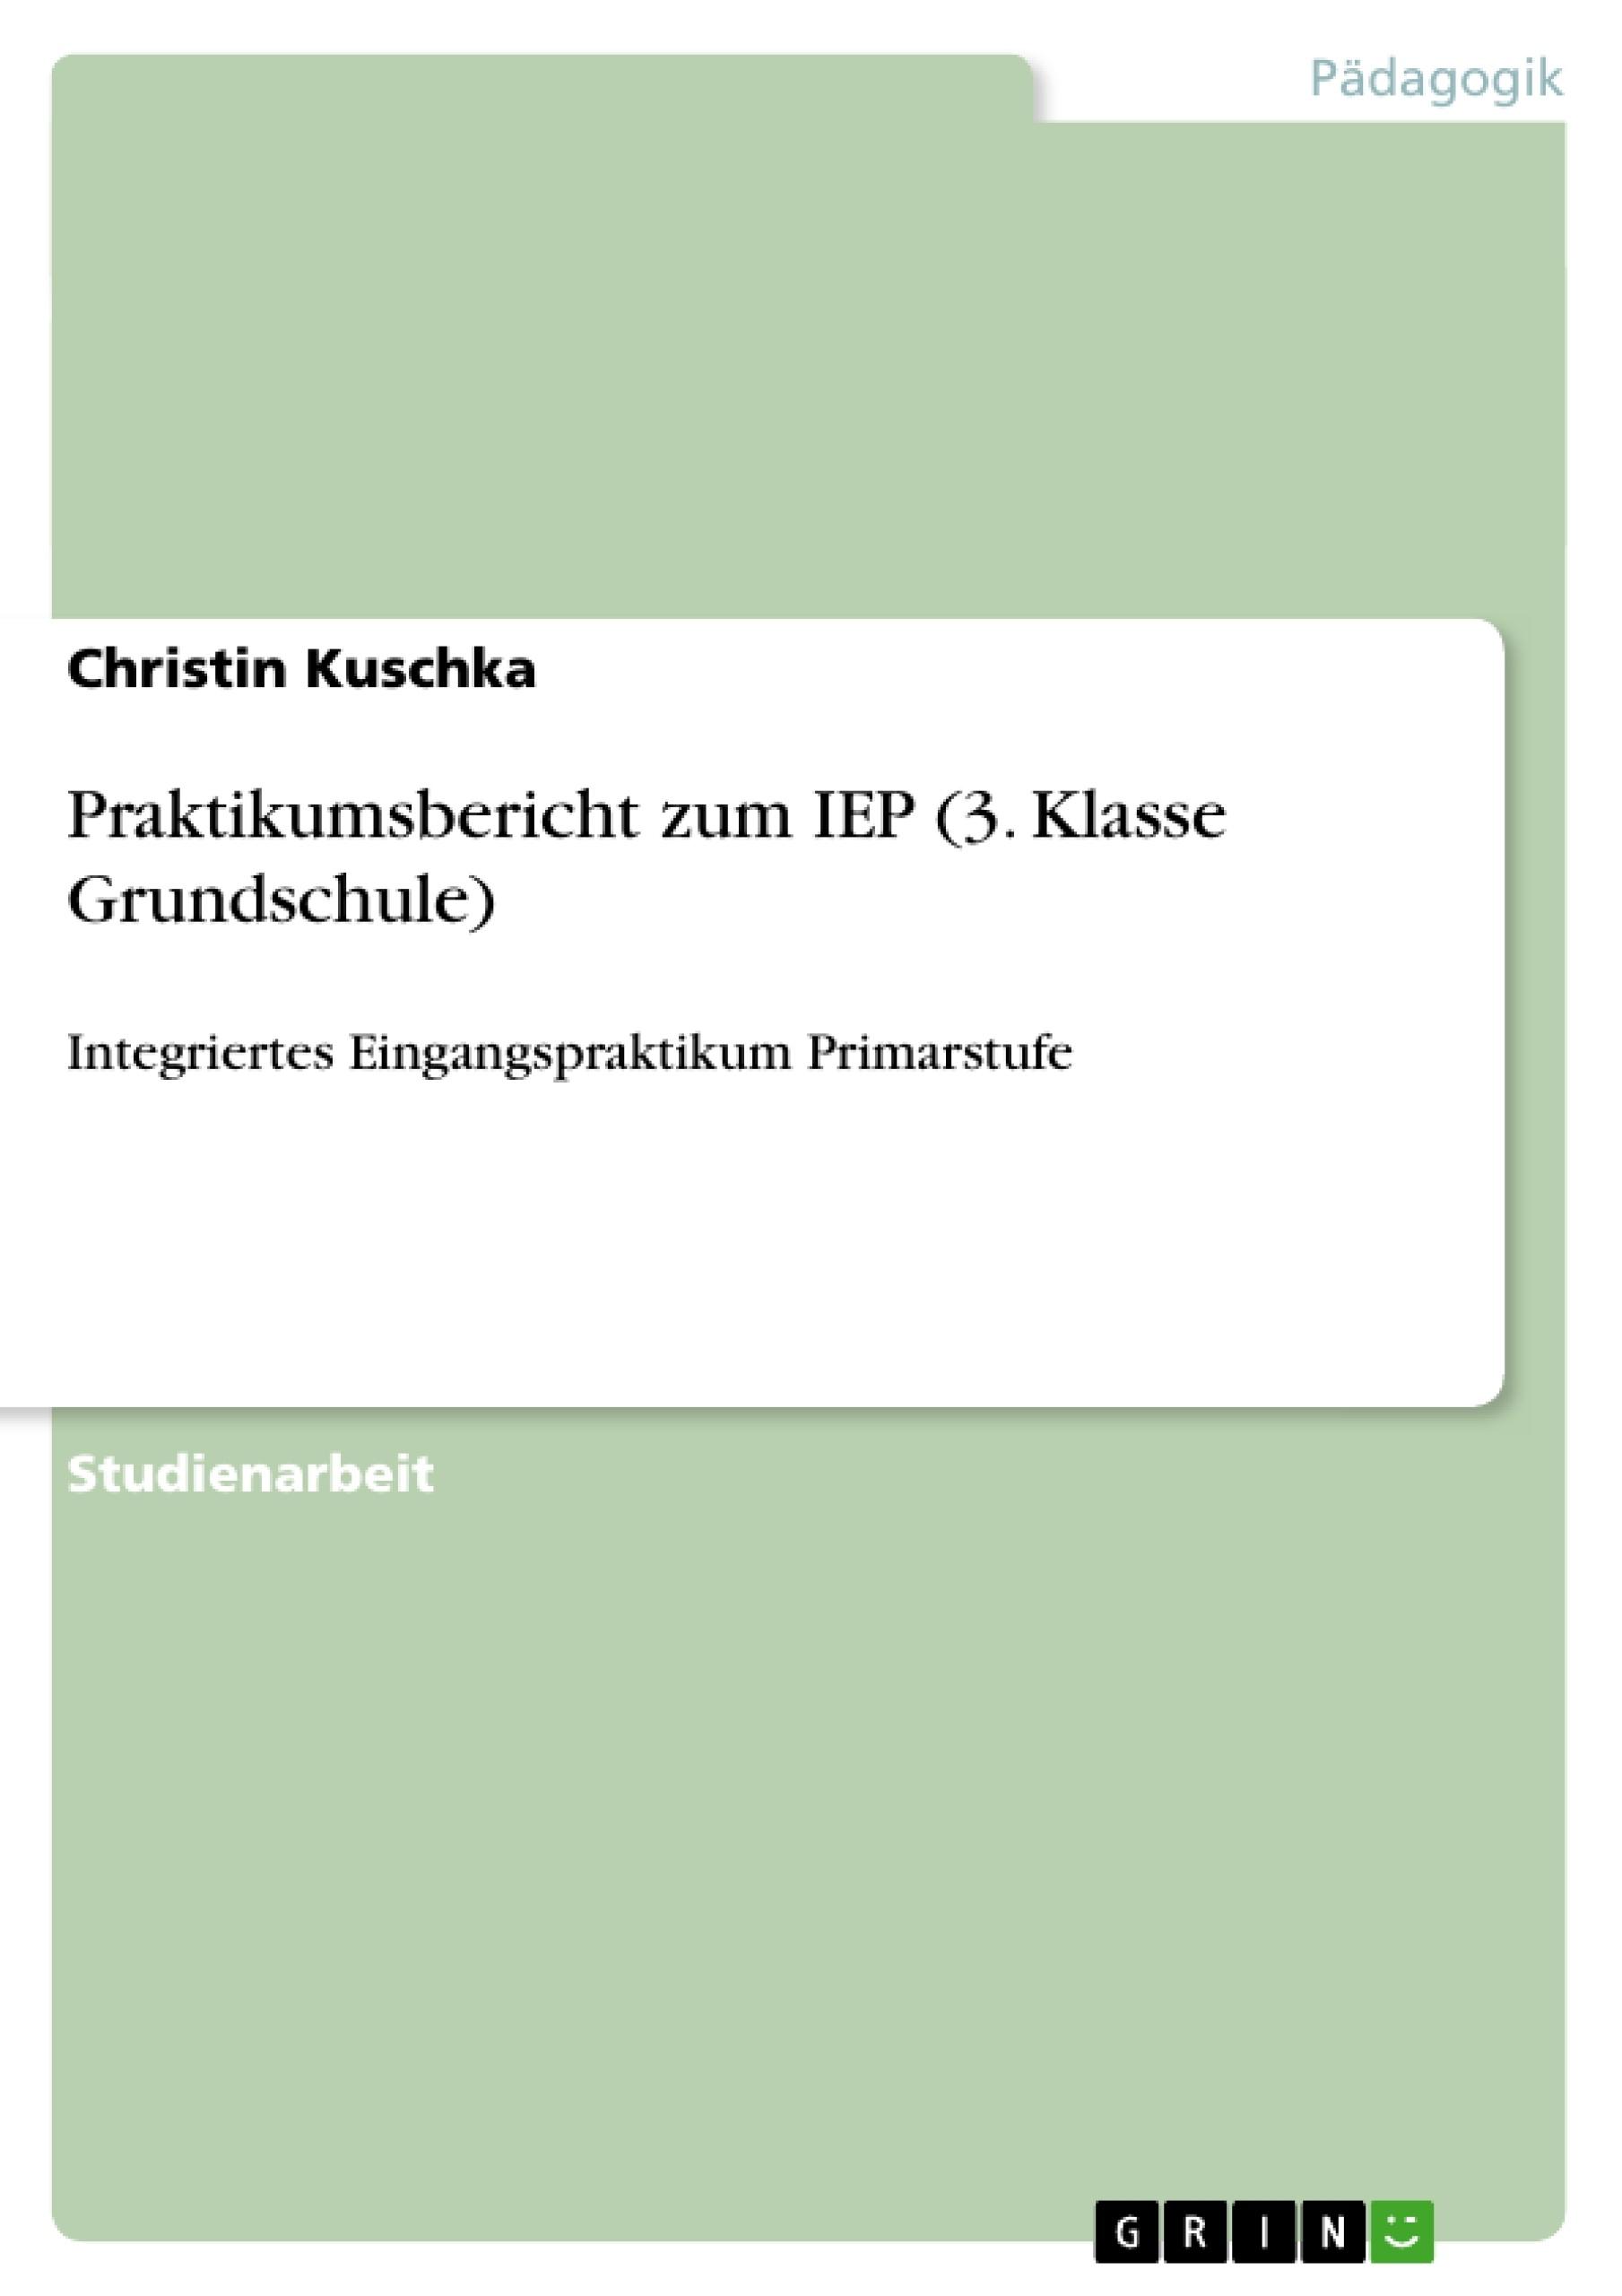 Titel: Praktikumsbericht zum IEP (3. Klasse Grundschule)